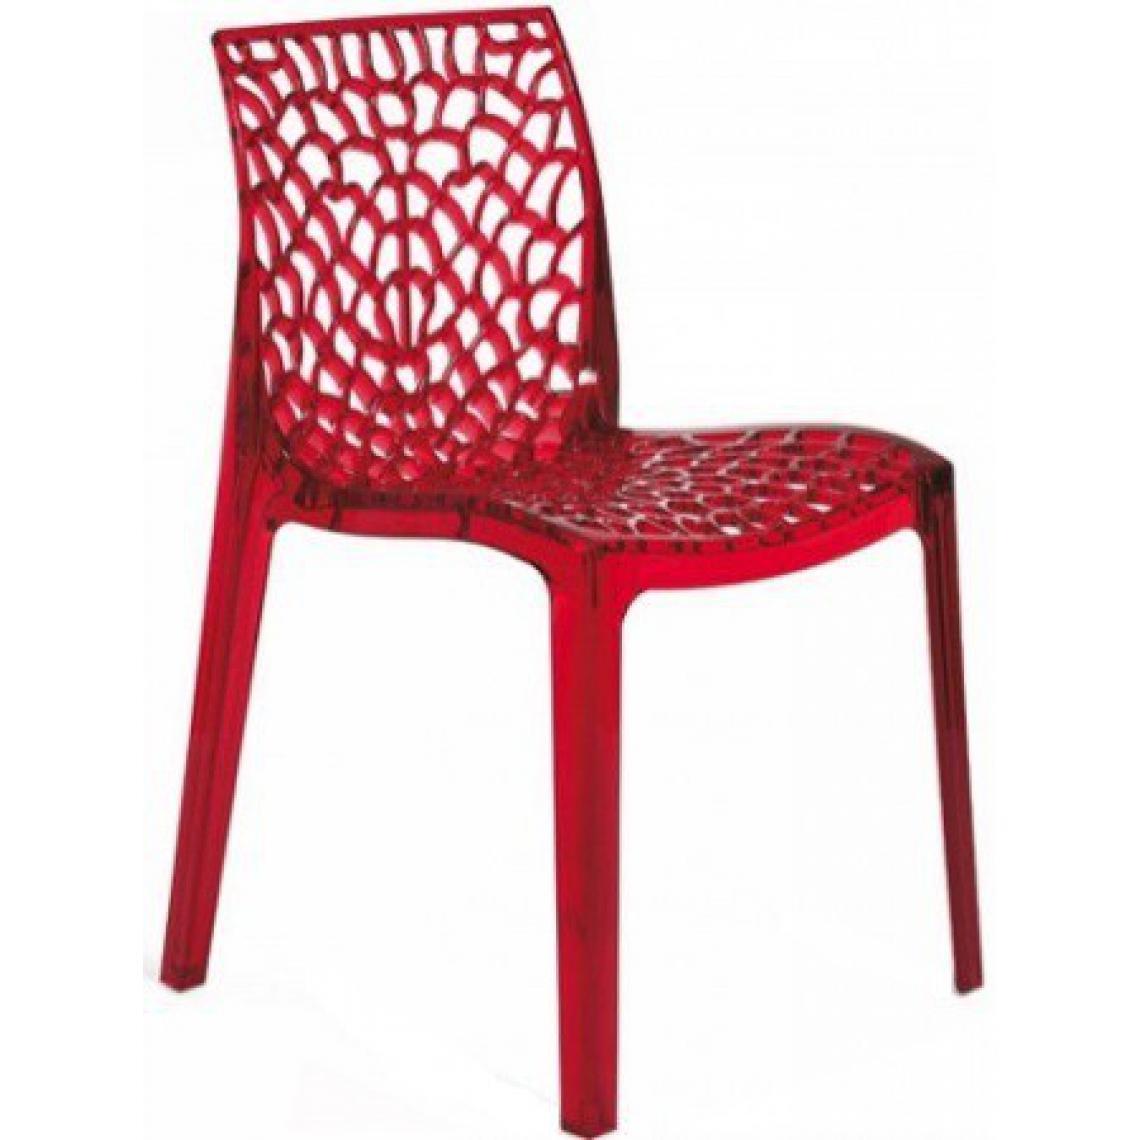 chaise design transparente rouge fum e gruyer 3 suisses. Black Bedroom Furniture Sets. Home Design Ideas